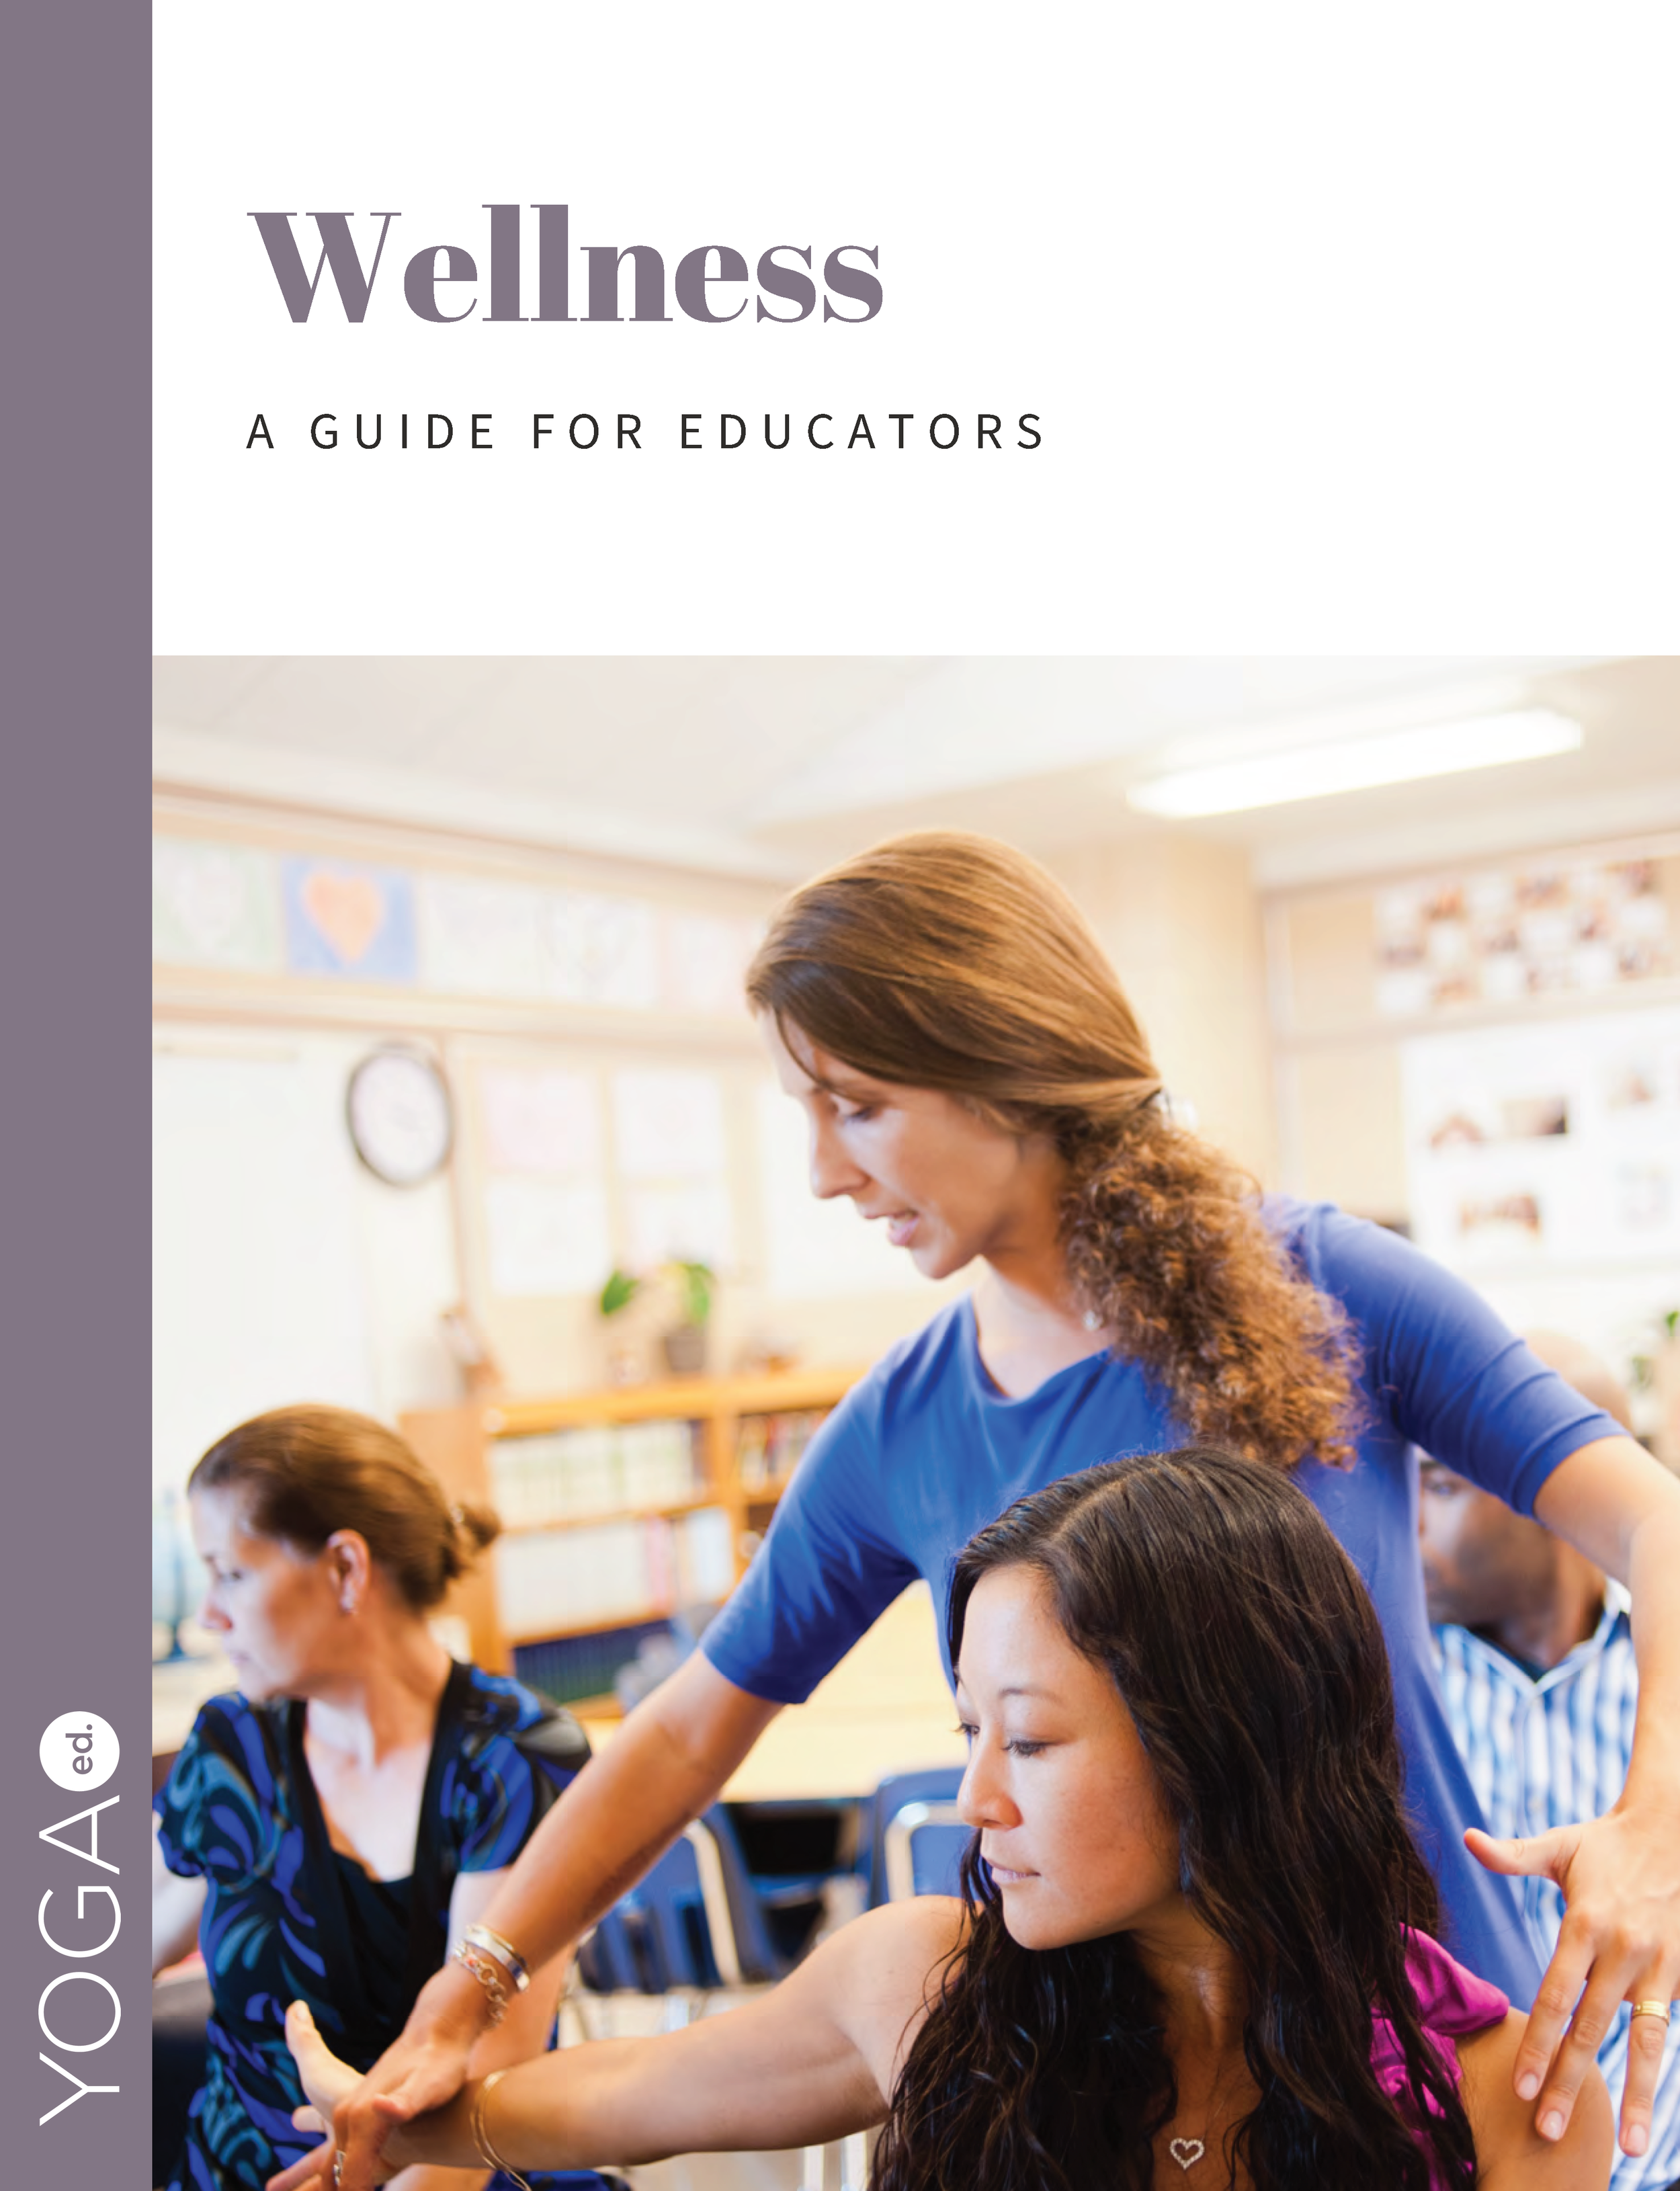 Yoga Ed Wellness Cover.png